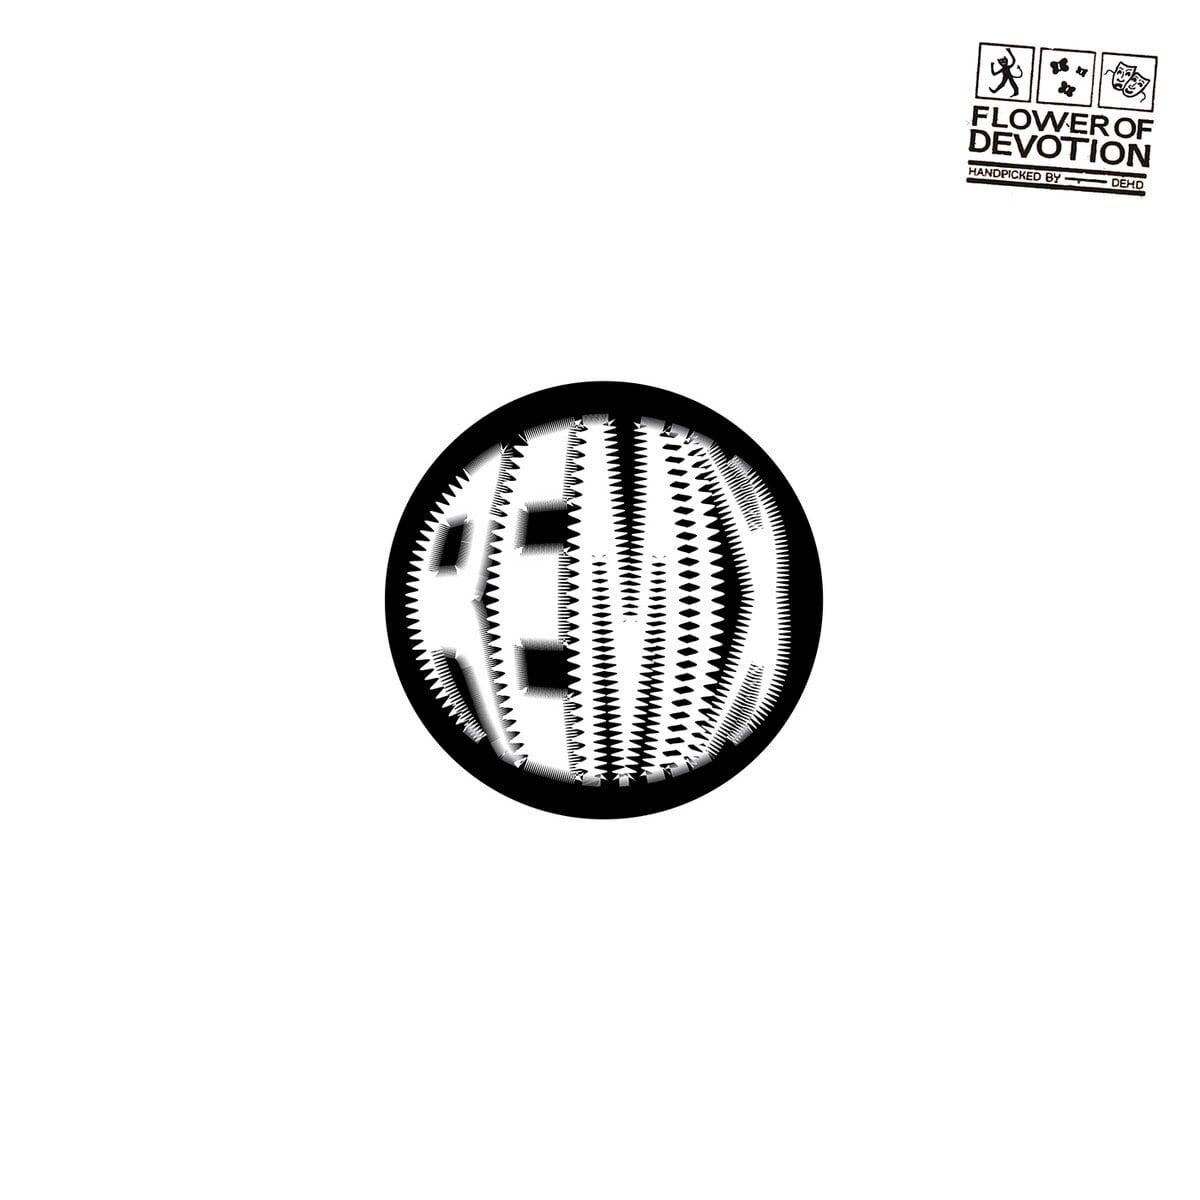 Dehd - Flower of Devotion Remixed (LTD. Pink Triple Button LP)